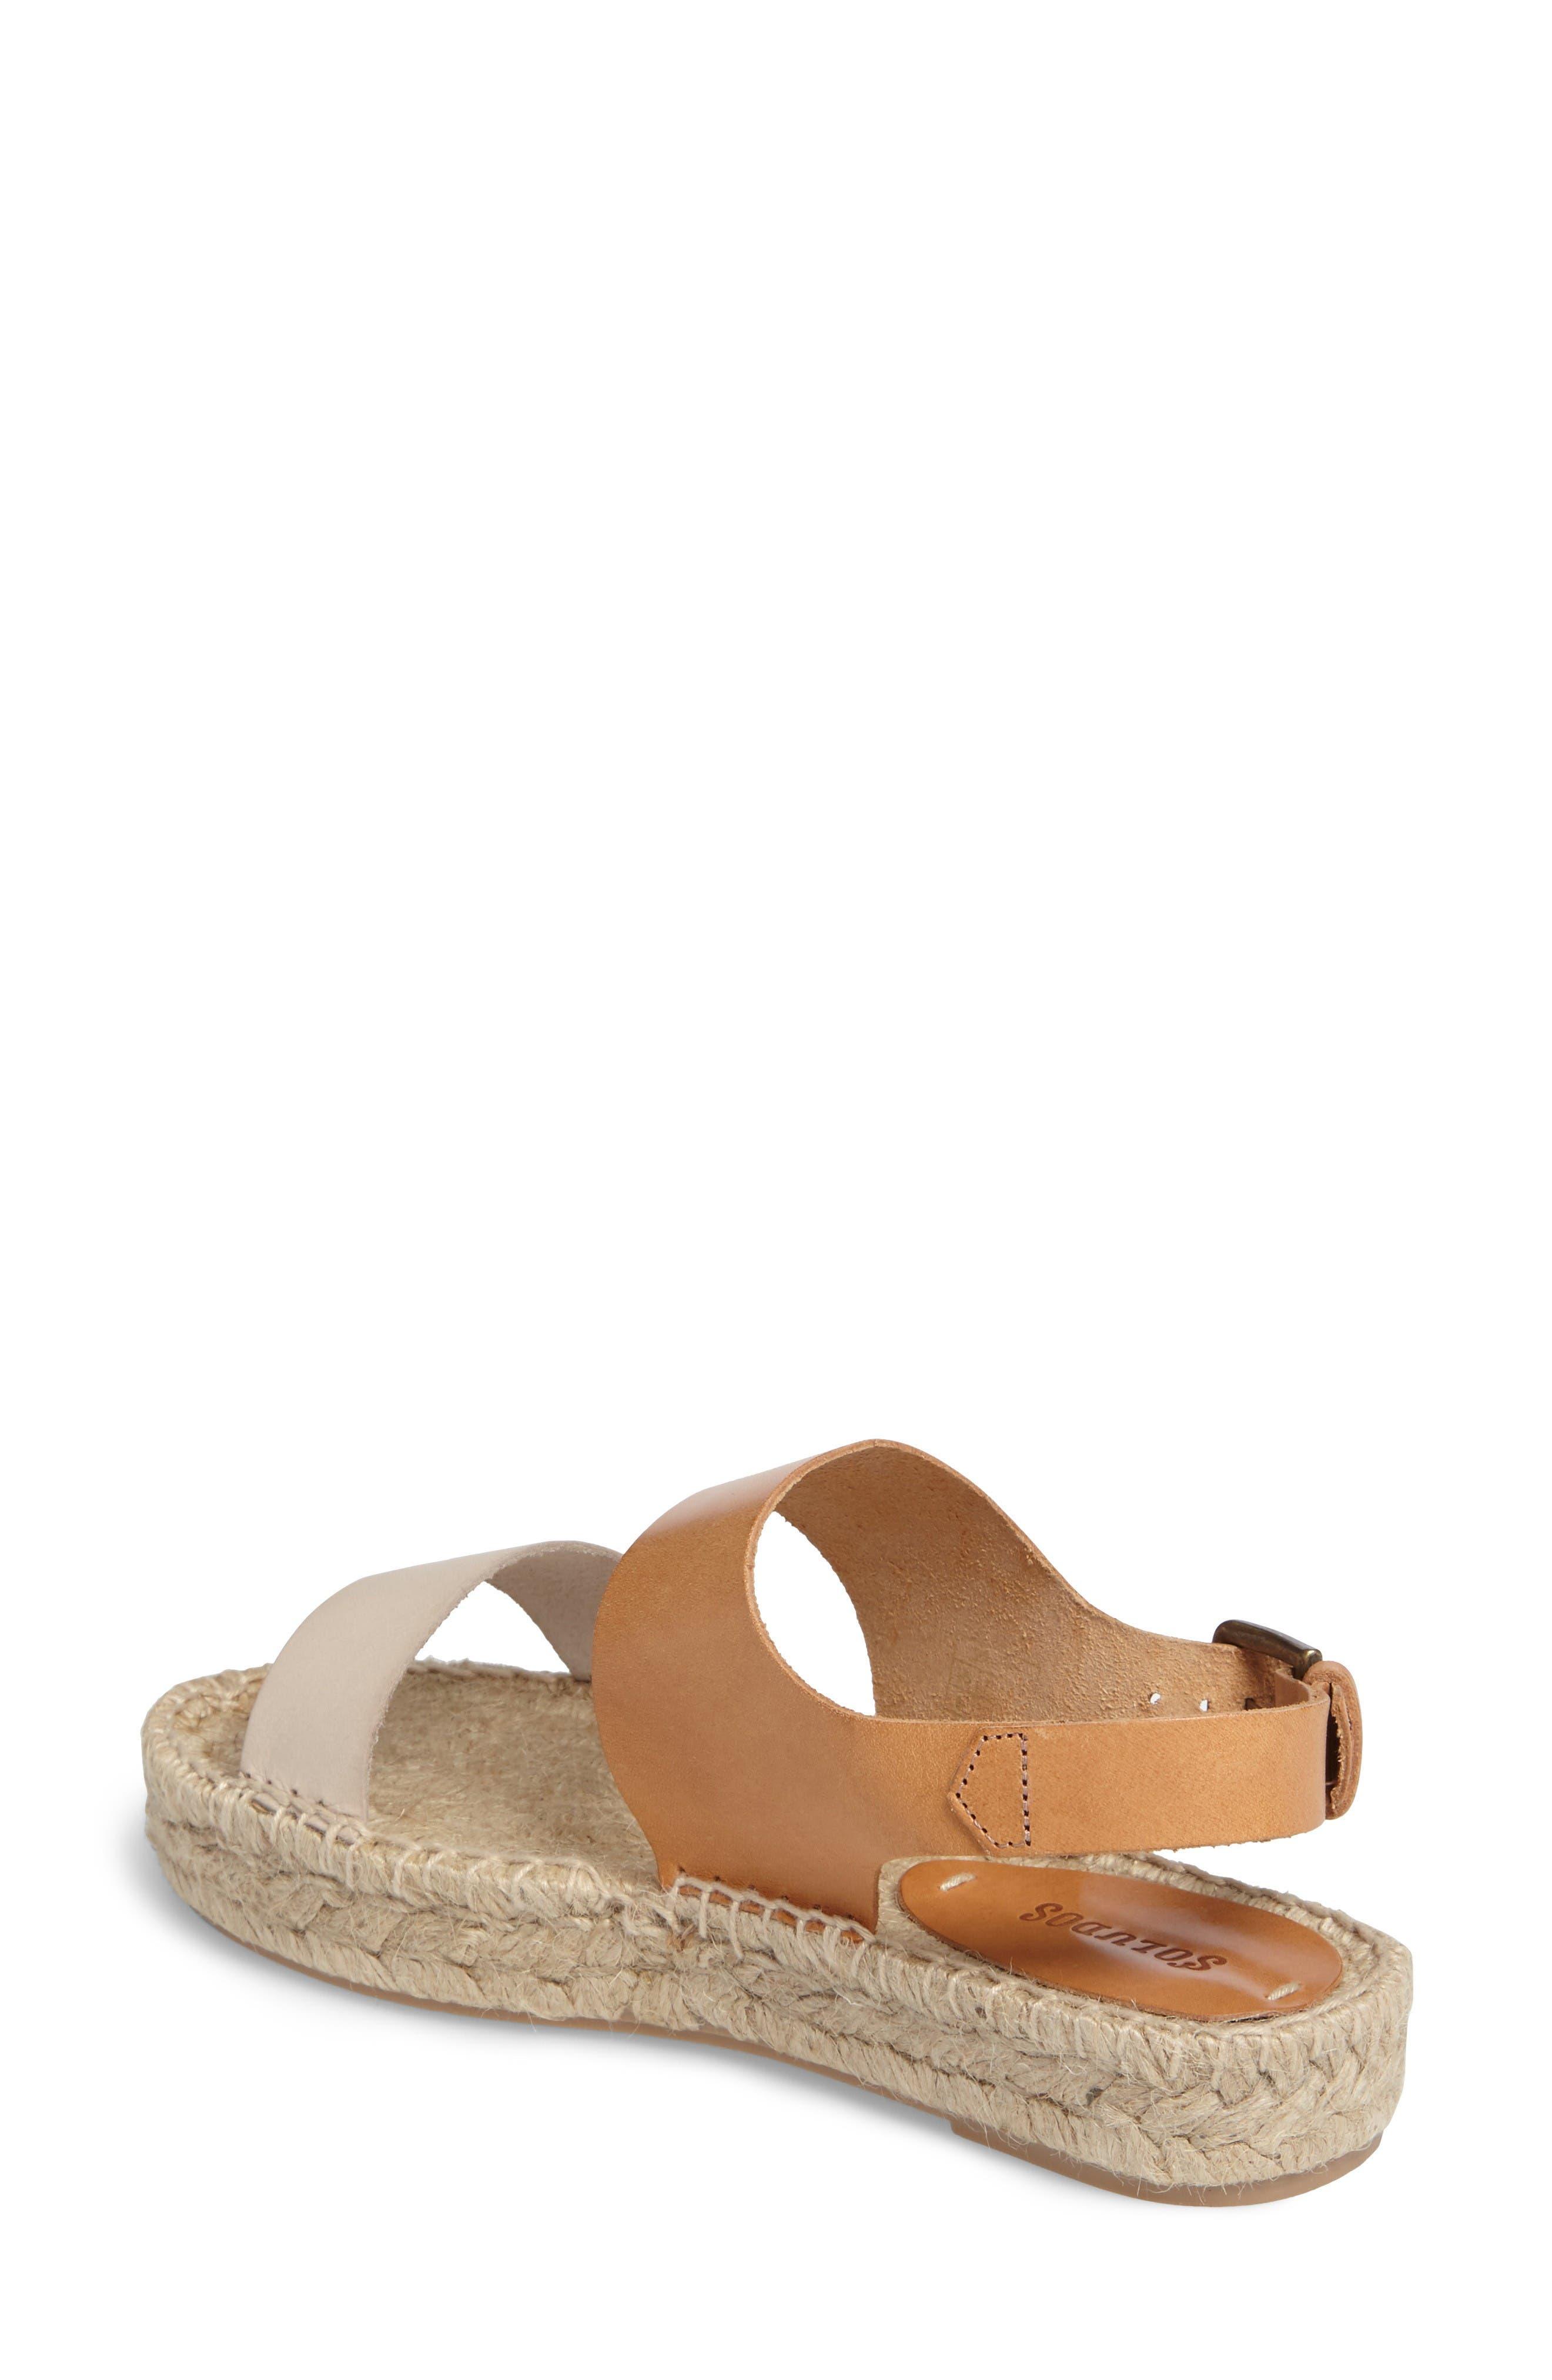 Alternate Image 2  - Soludos Platform Espadrille Sandal (Women)